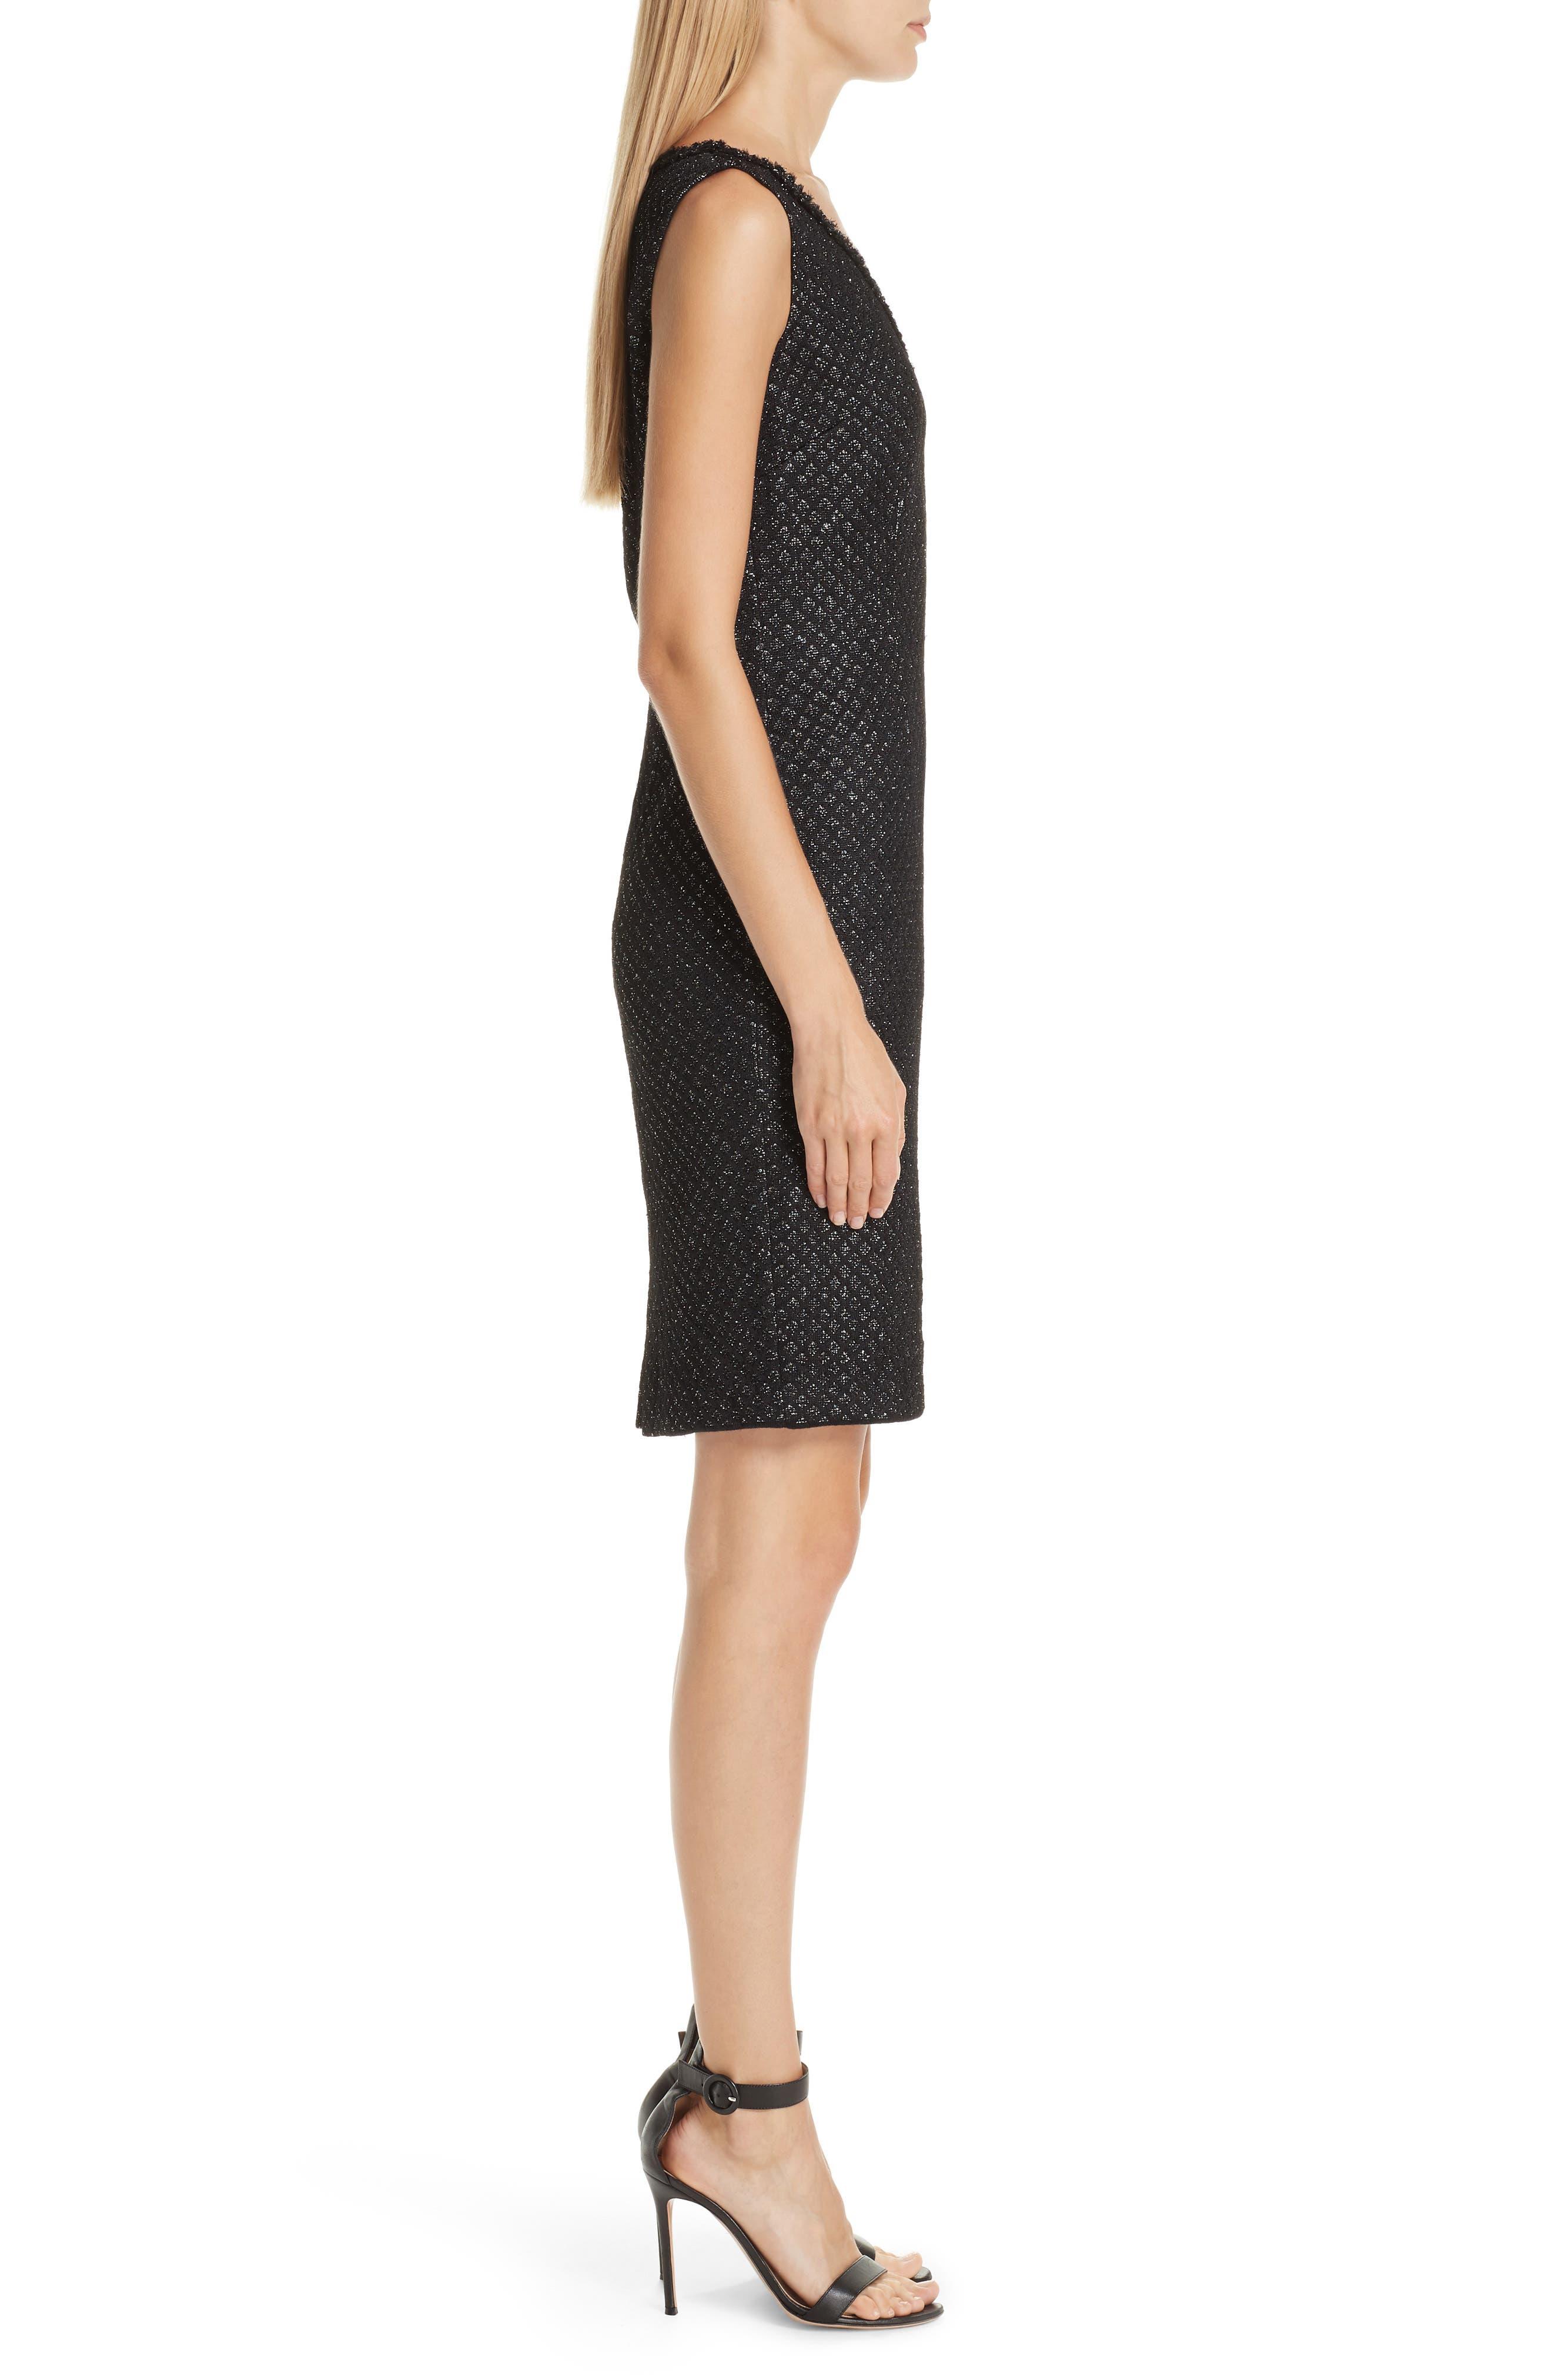 ST. JOHN COLLECTION, Shimmer Inlay Brocade Knit Dress, Alternate thumbnail 3, color, CAVIAR/ SILVER